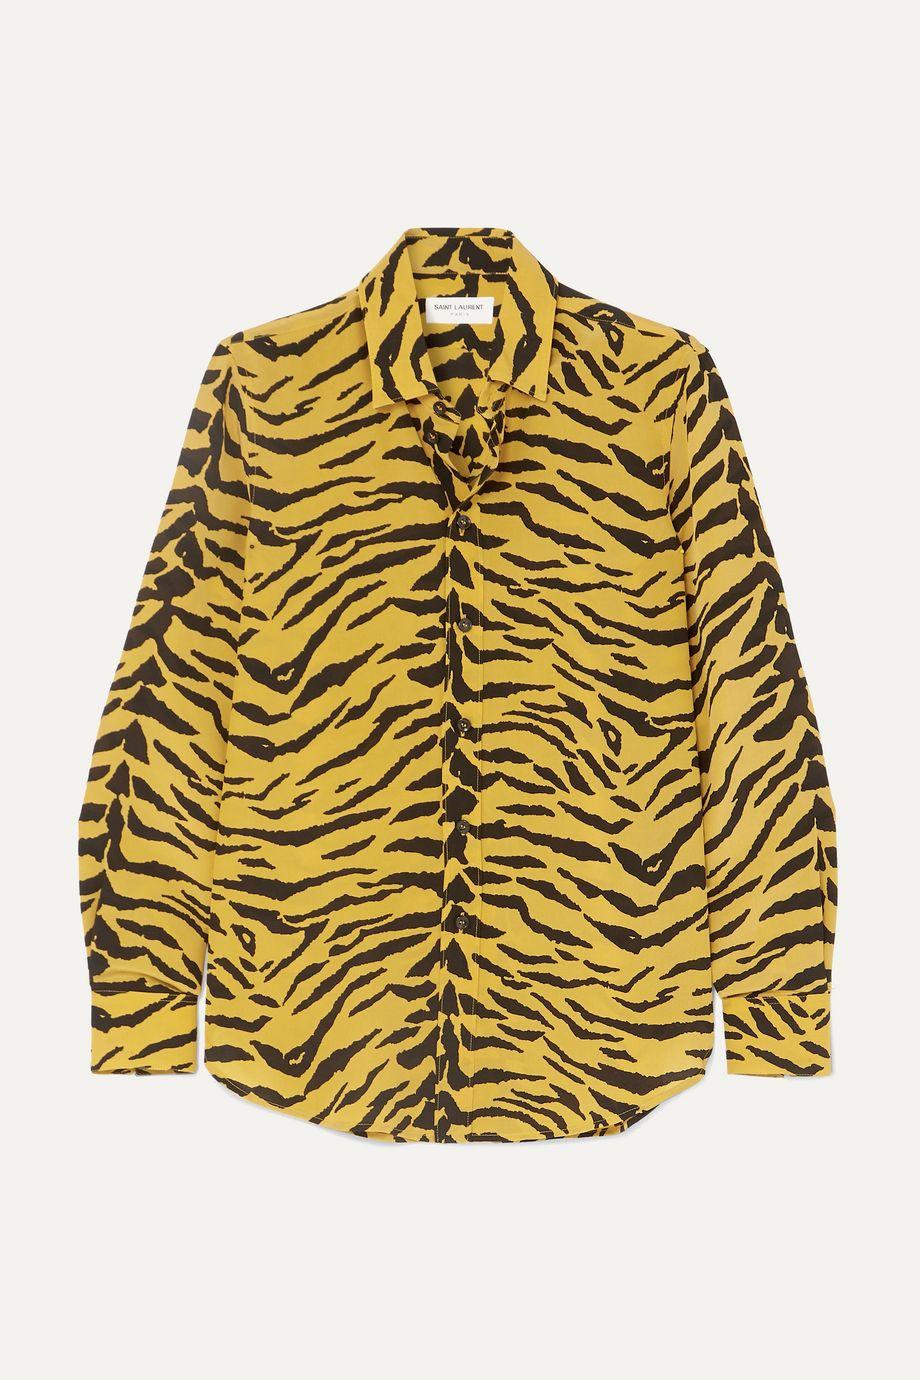 SAINT LAURENT Zebra-print silk-crepe shirt